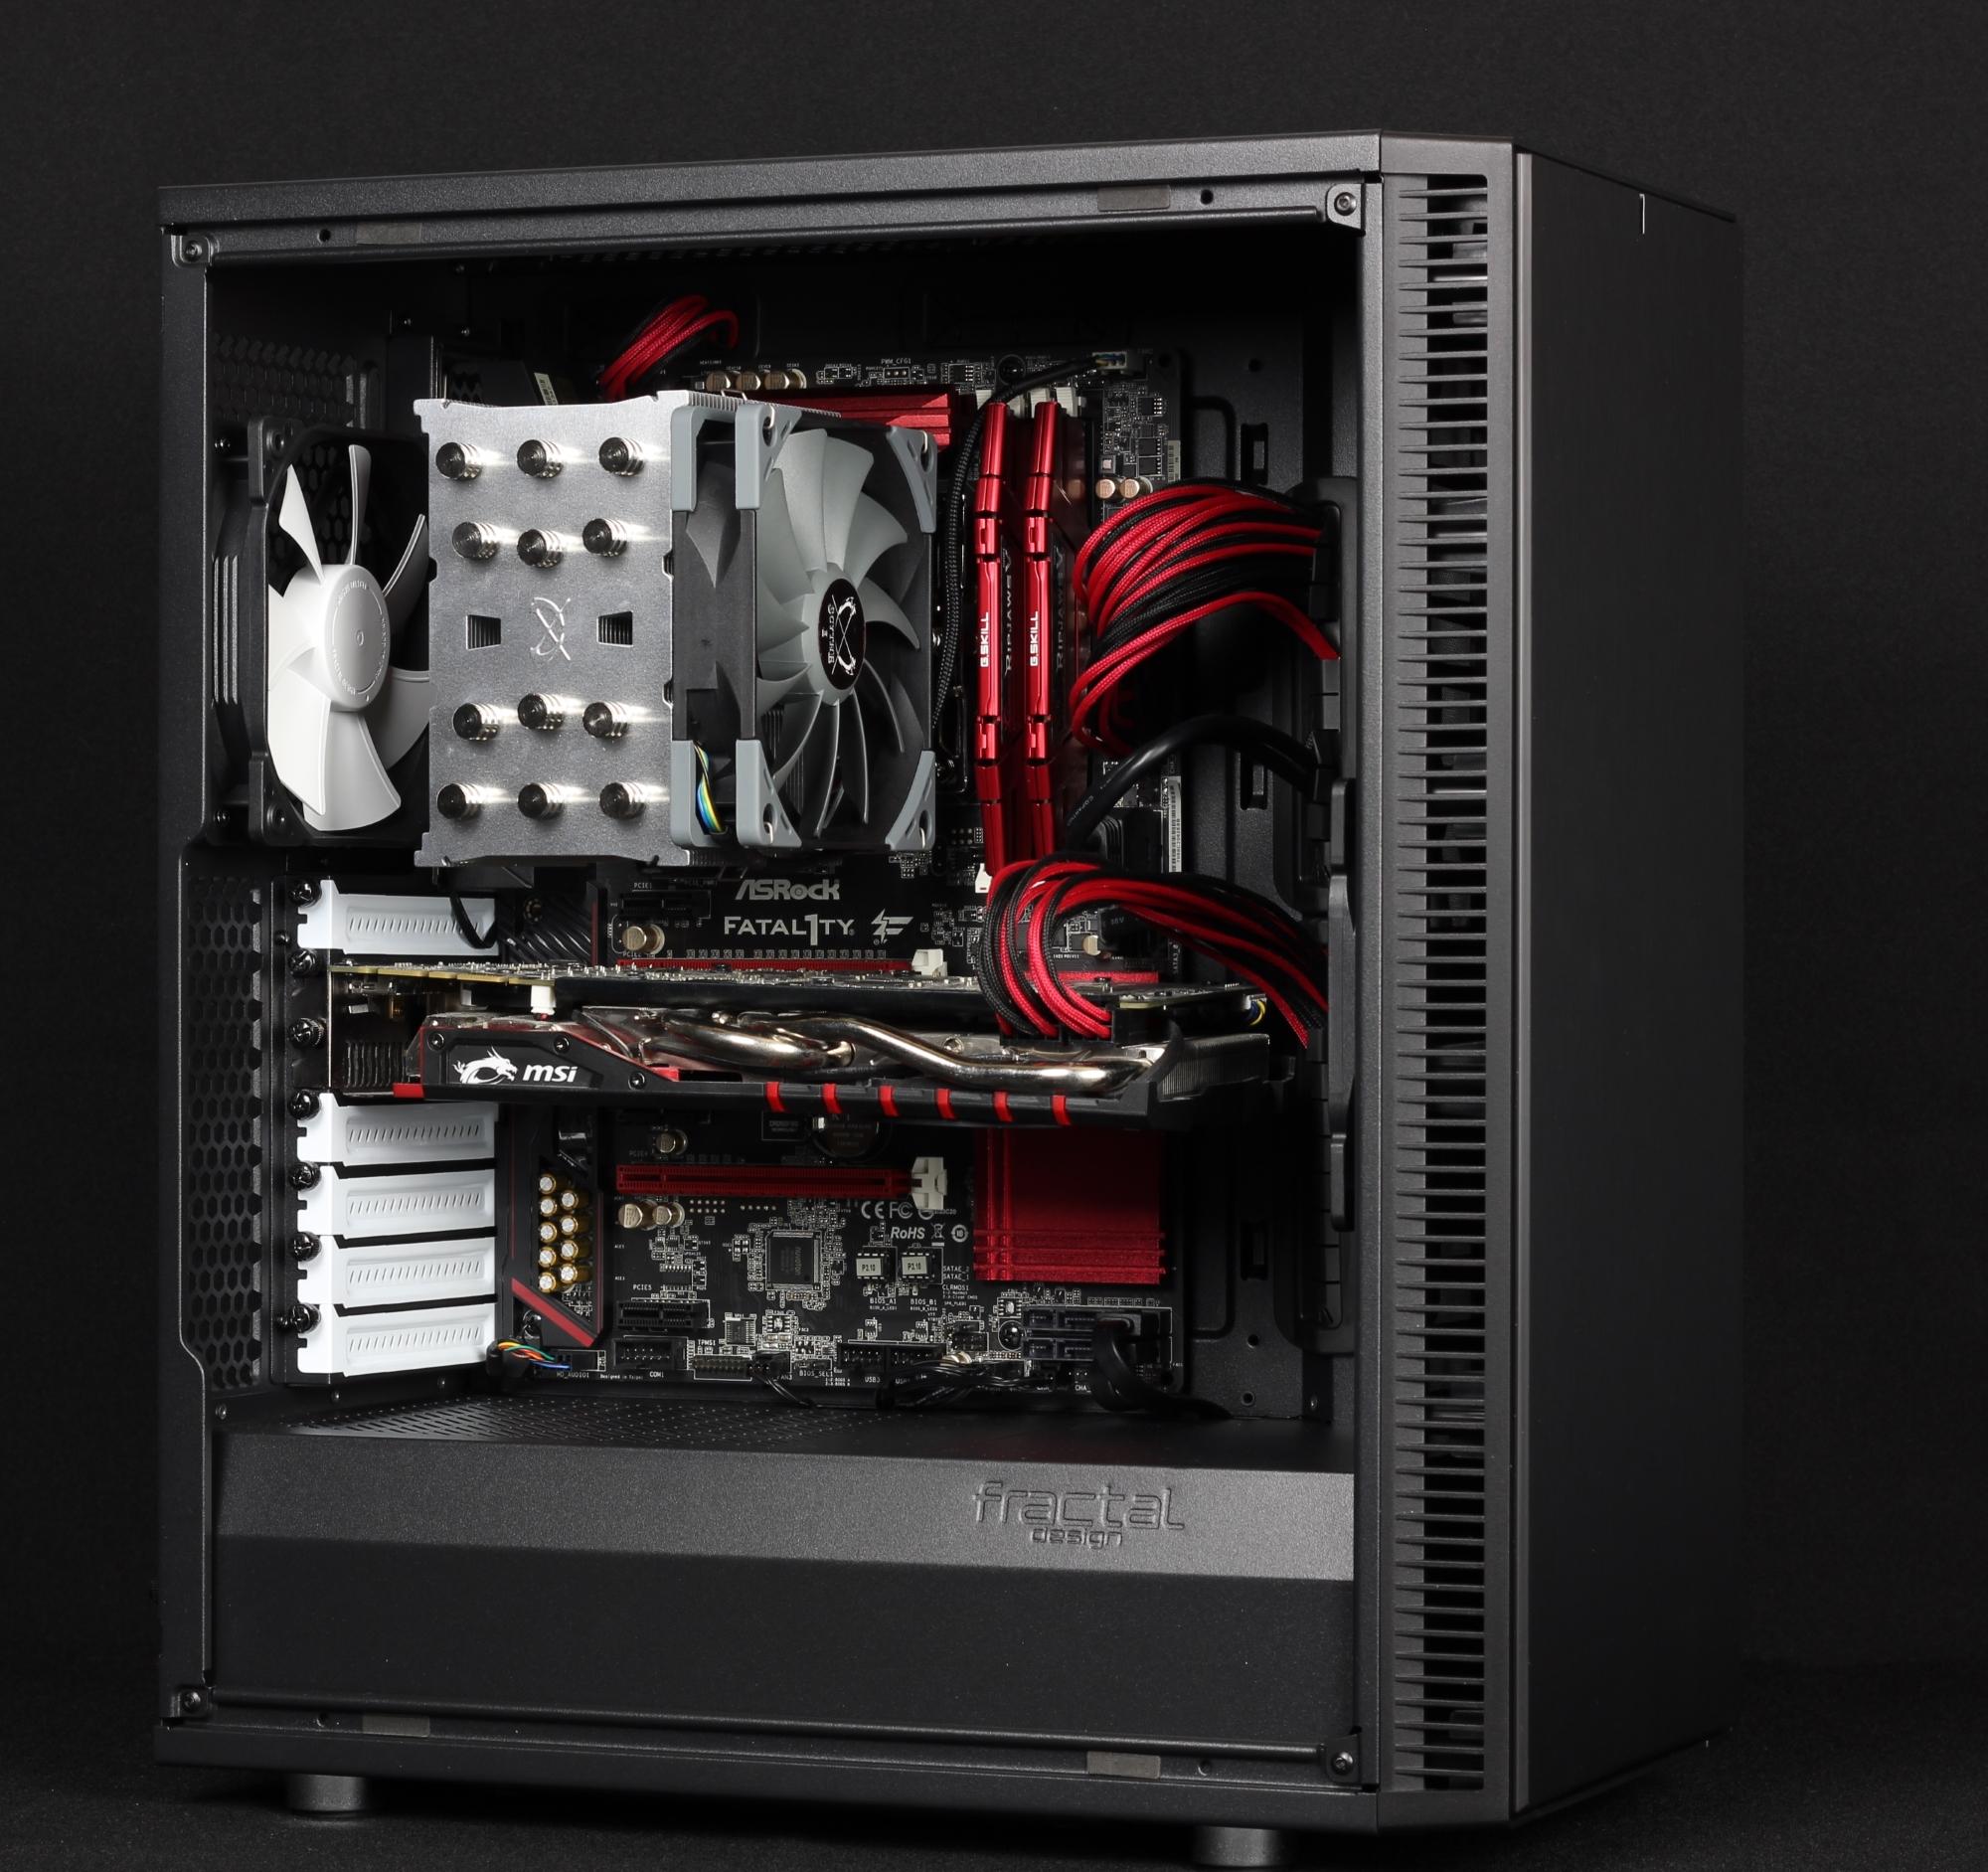 Fractal Define C mit Hardware, Asrock Z170, Intel i7, MSI Nvidia GTX